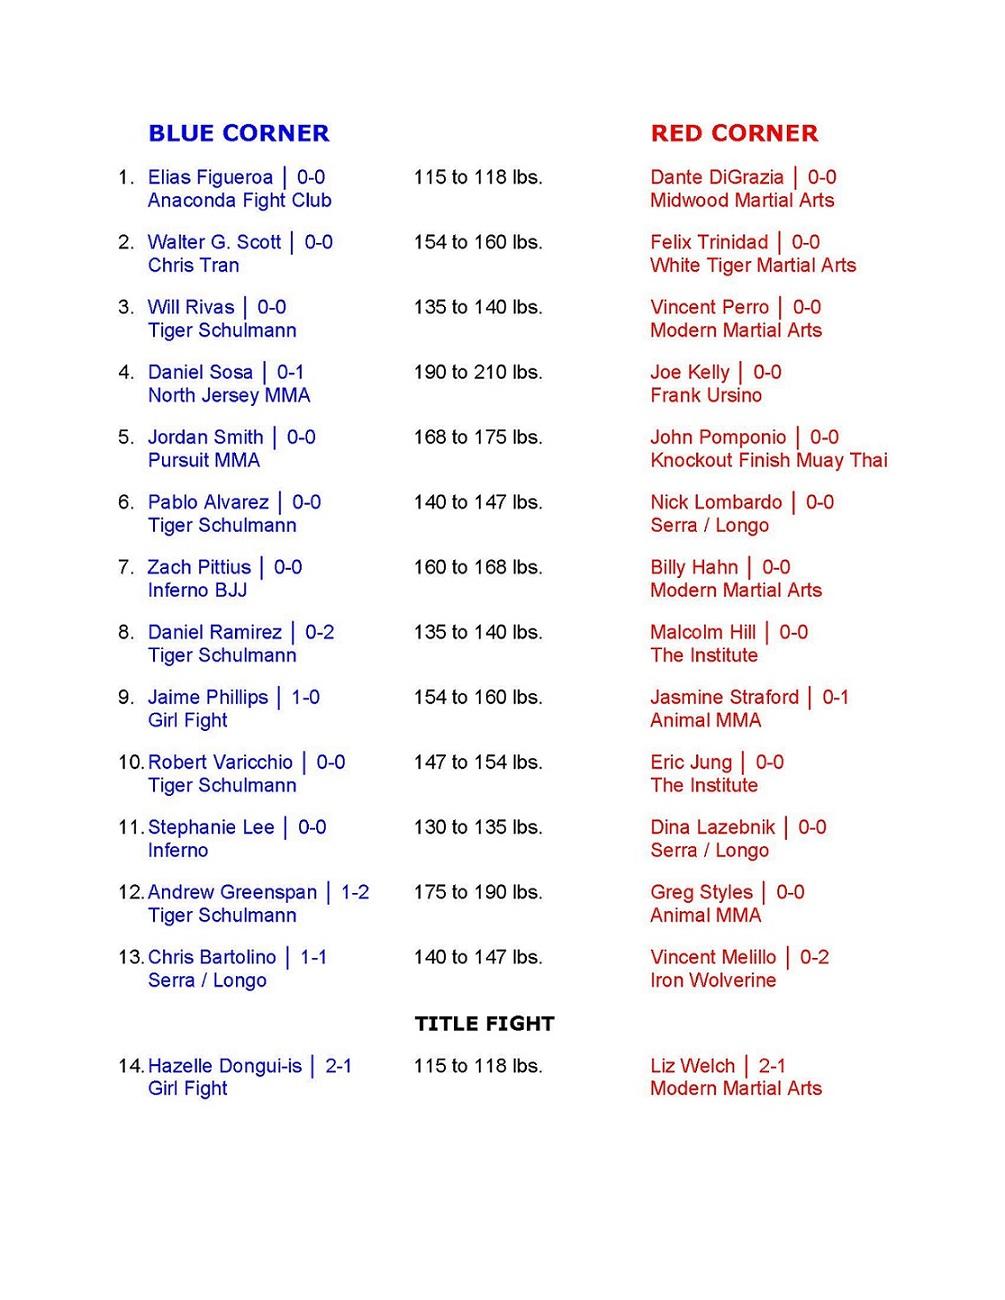 World Class Kickboxing Championships 2 - Bout Order